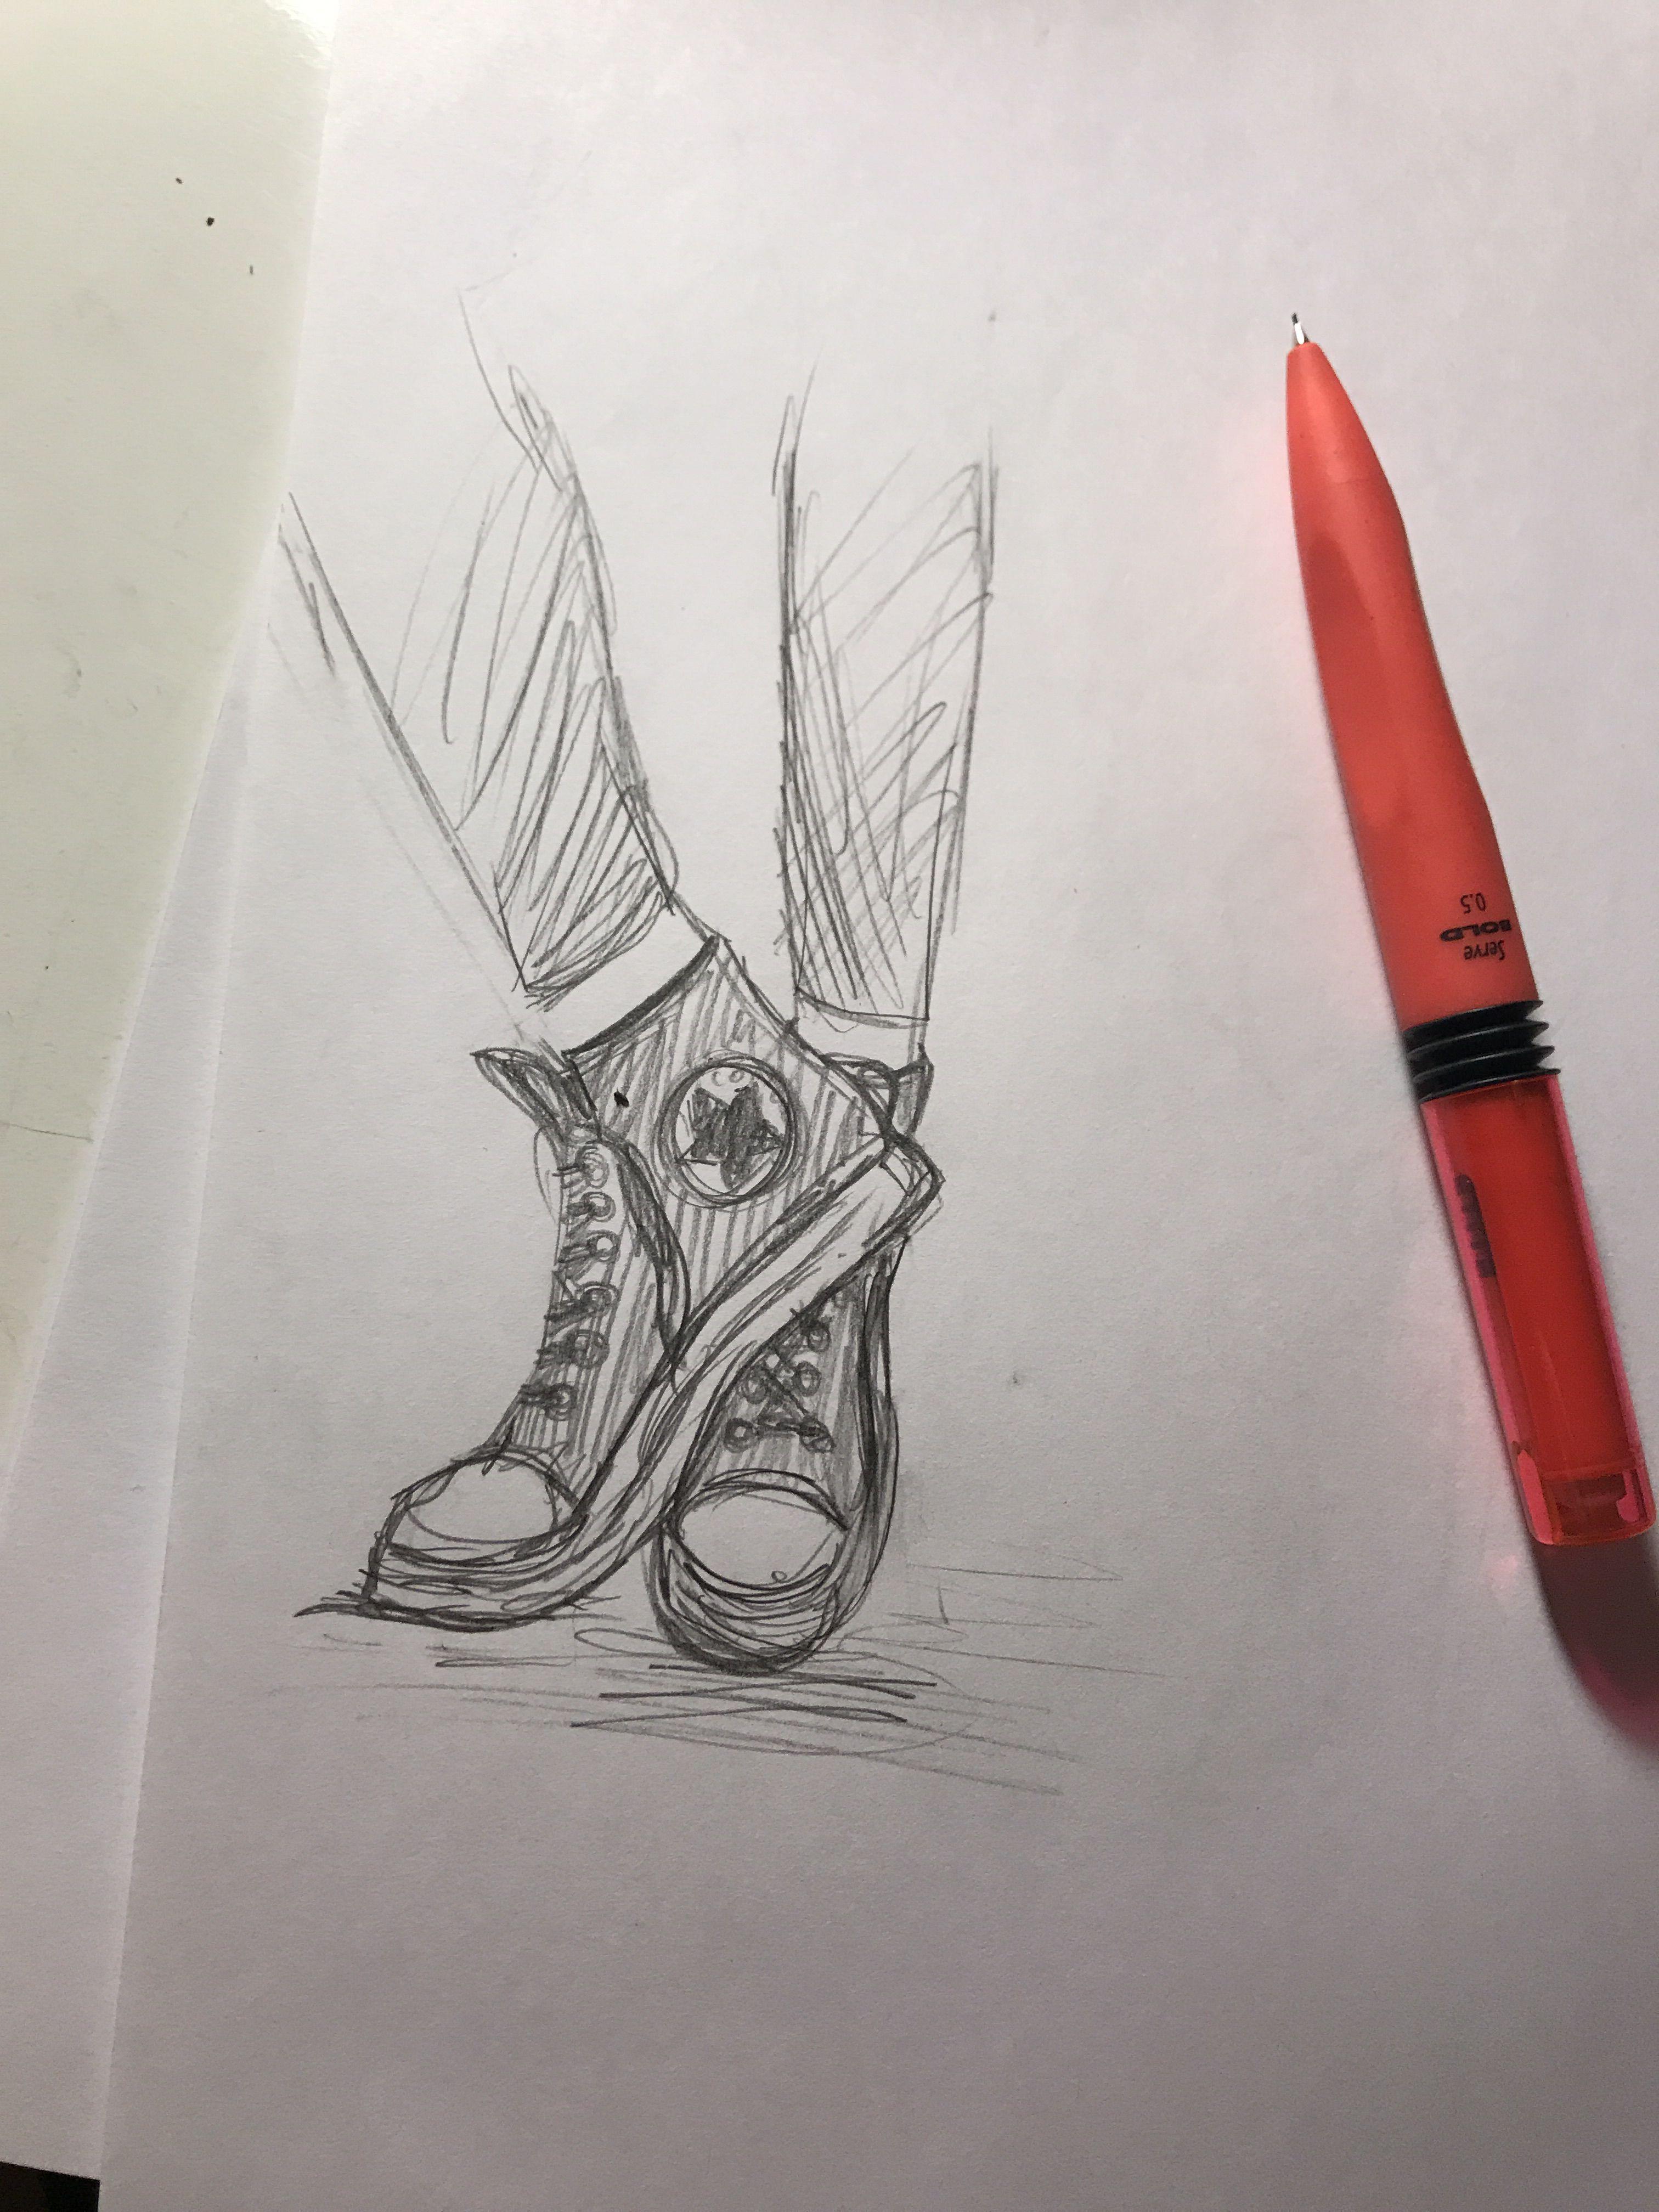 converse art shoes drawing Çizimler, Çizim